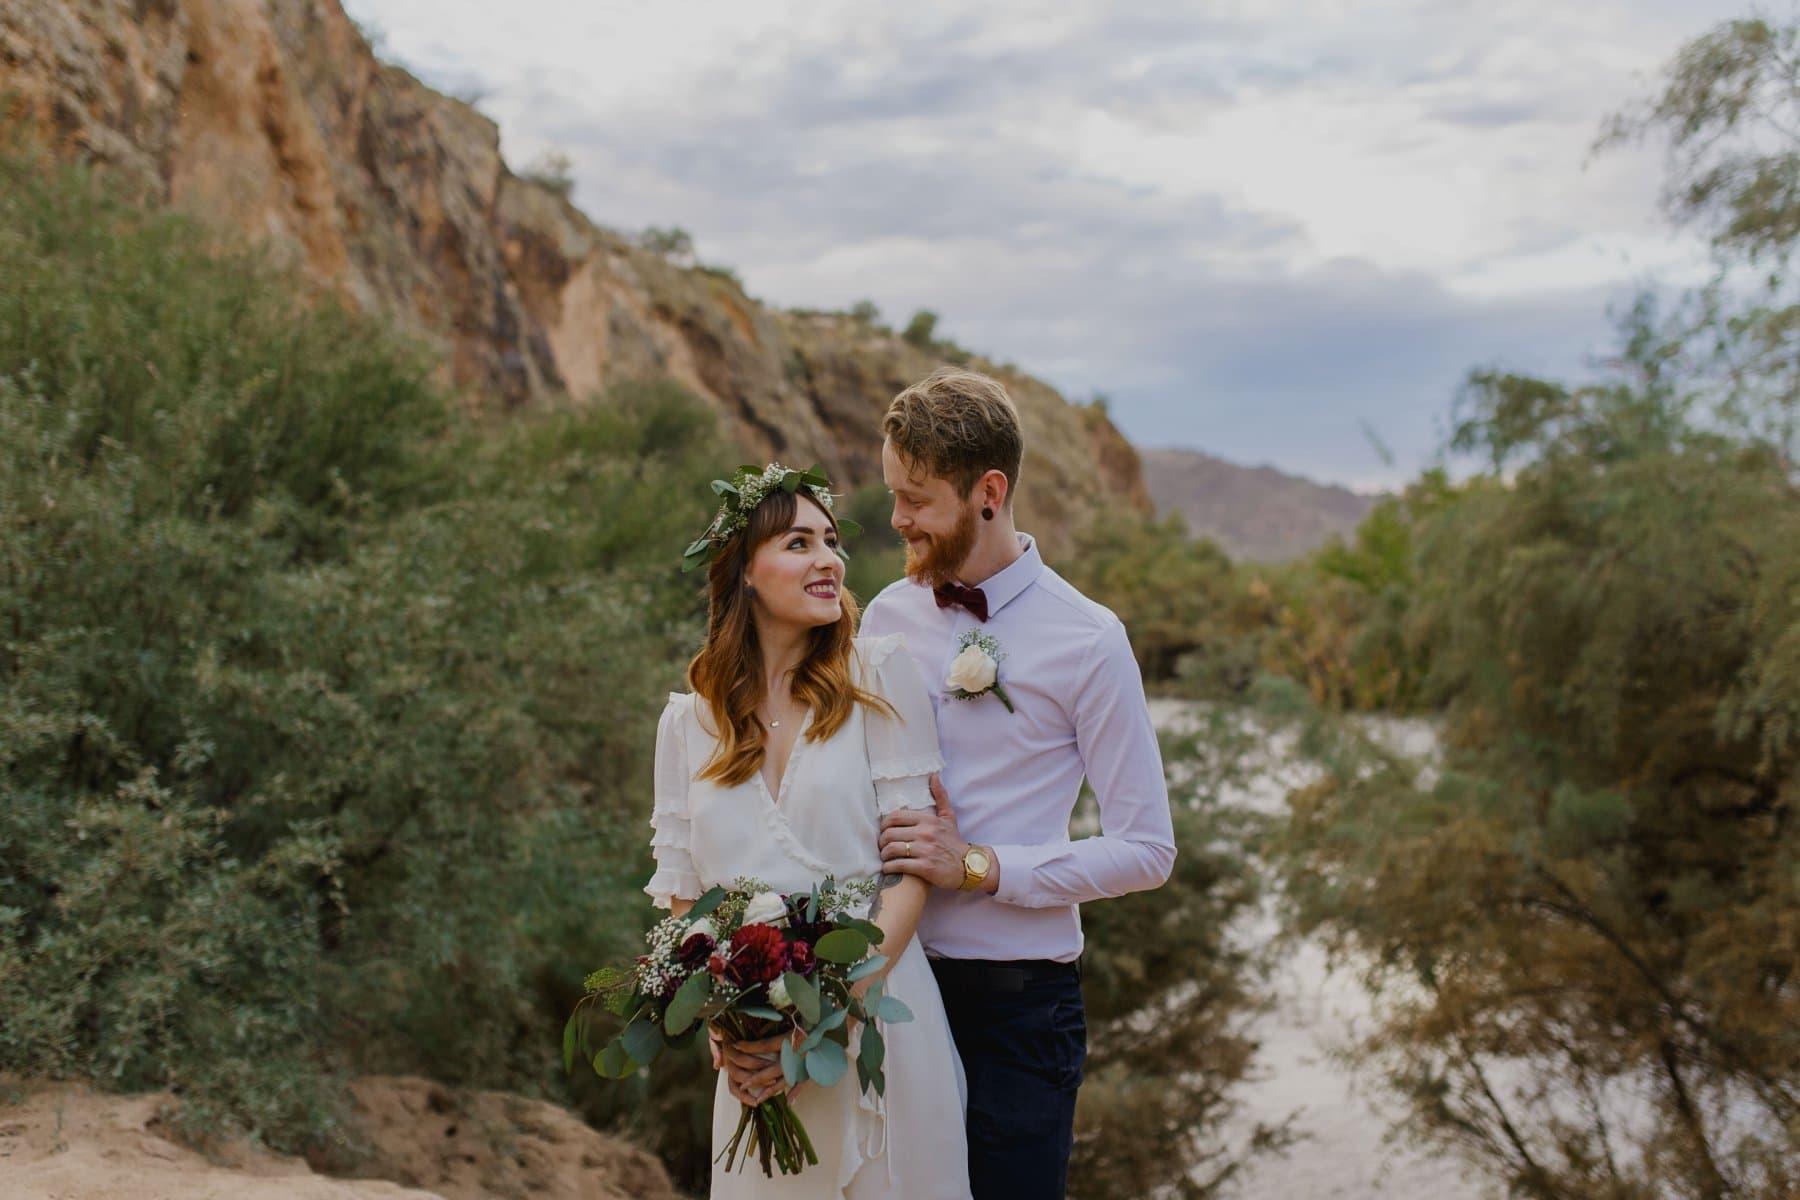 Arizona elopement non-desert locations